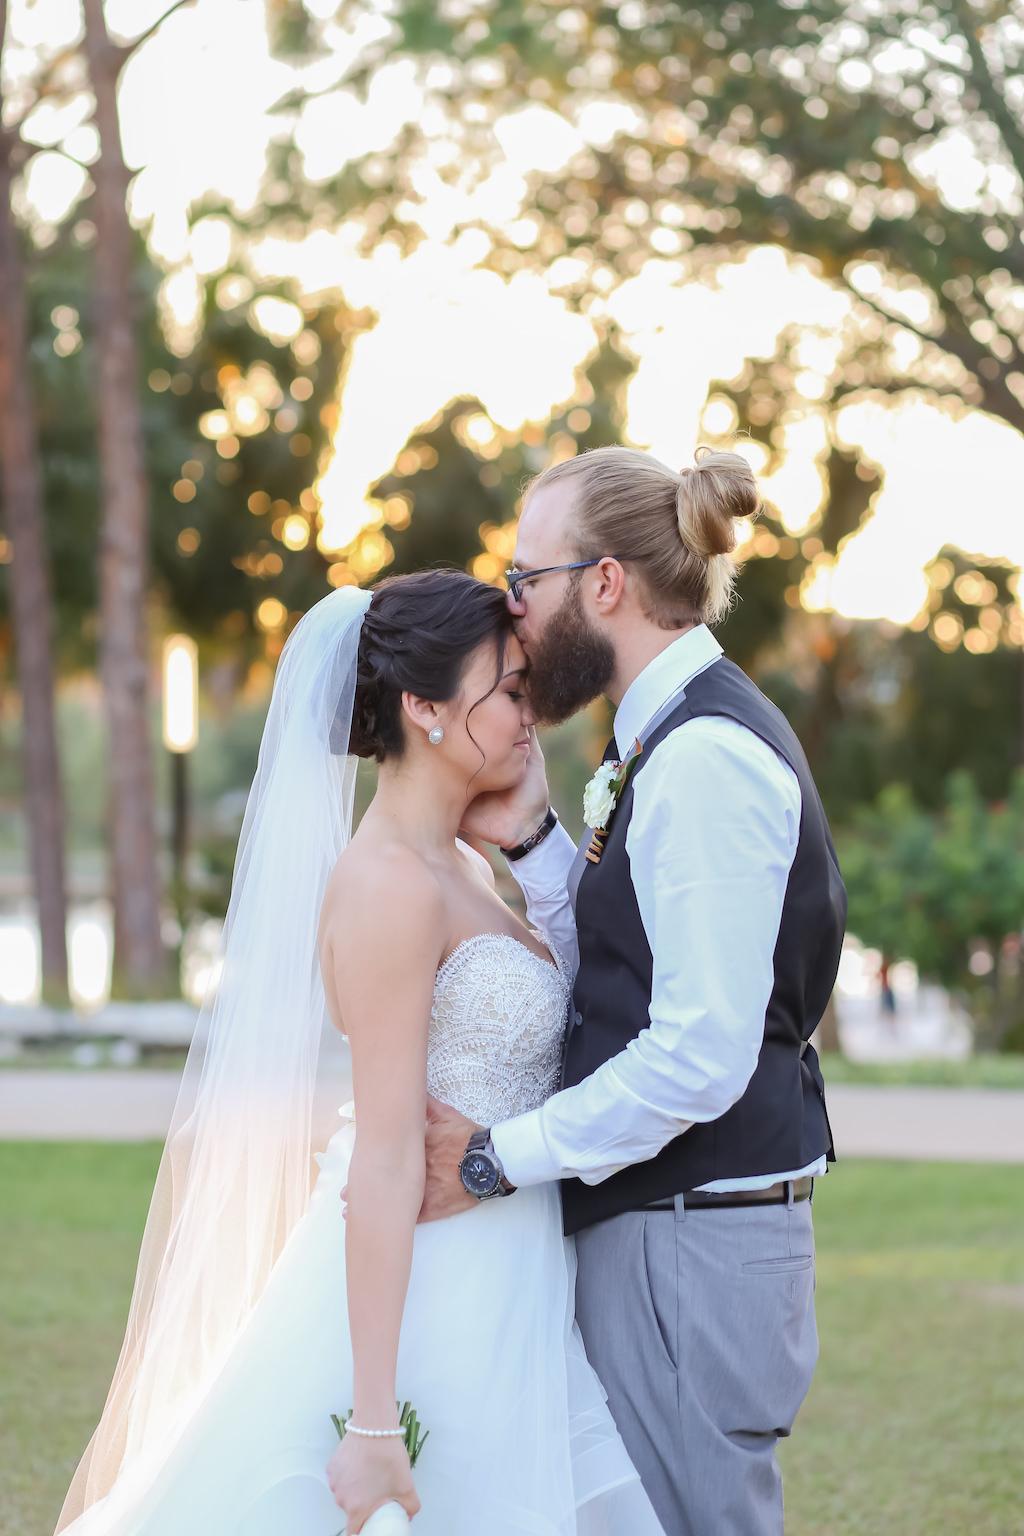 Florida Bride and Groom Outdoor Wedding Portrait   Downtown Tampa Wedding Photographer Lifelong Photography Studios